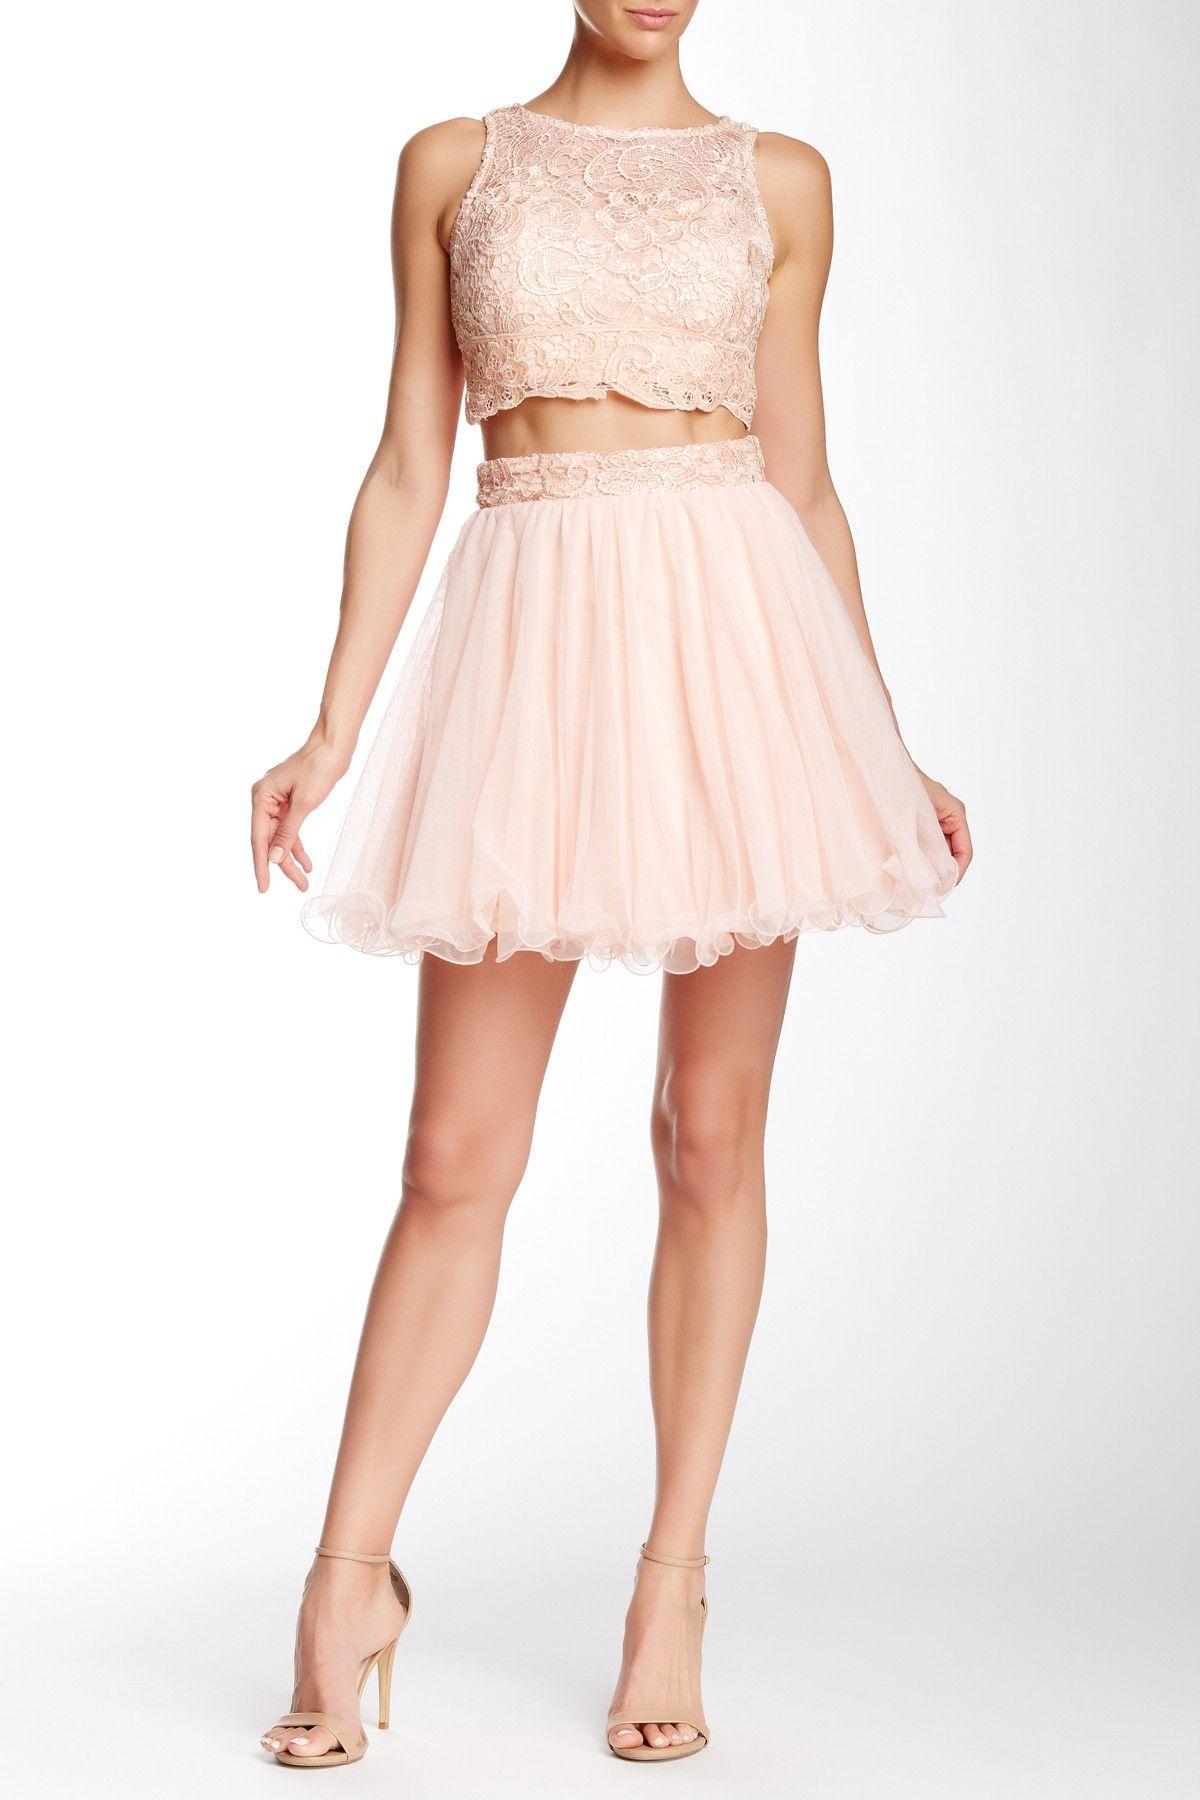 Lace Yoke Overlay Tulle 2 Piece Set Juniors Fashion Pink Prom Dress Dresses [ 1800 x 1200 Pixel ]